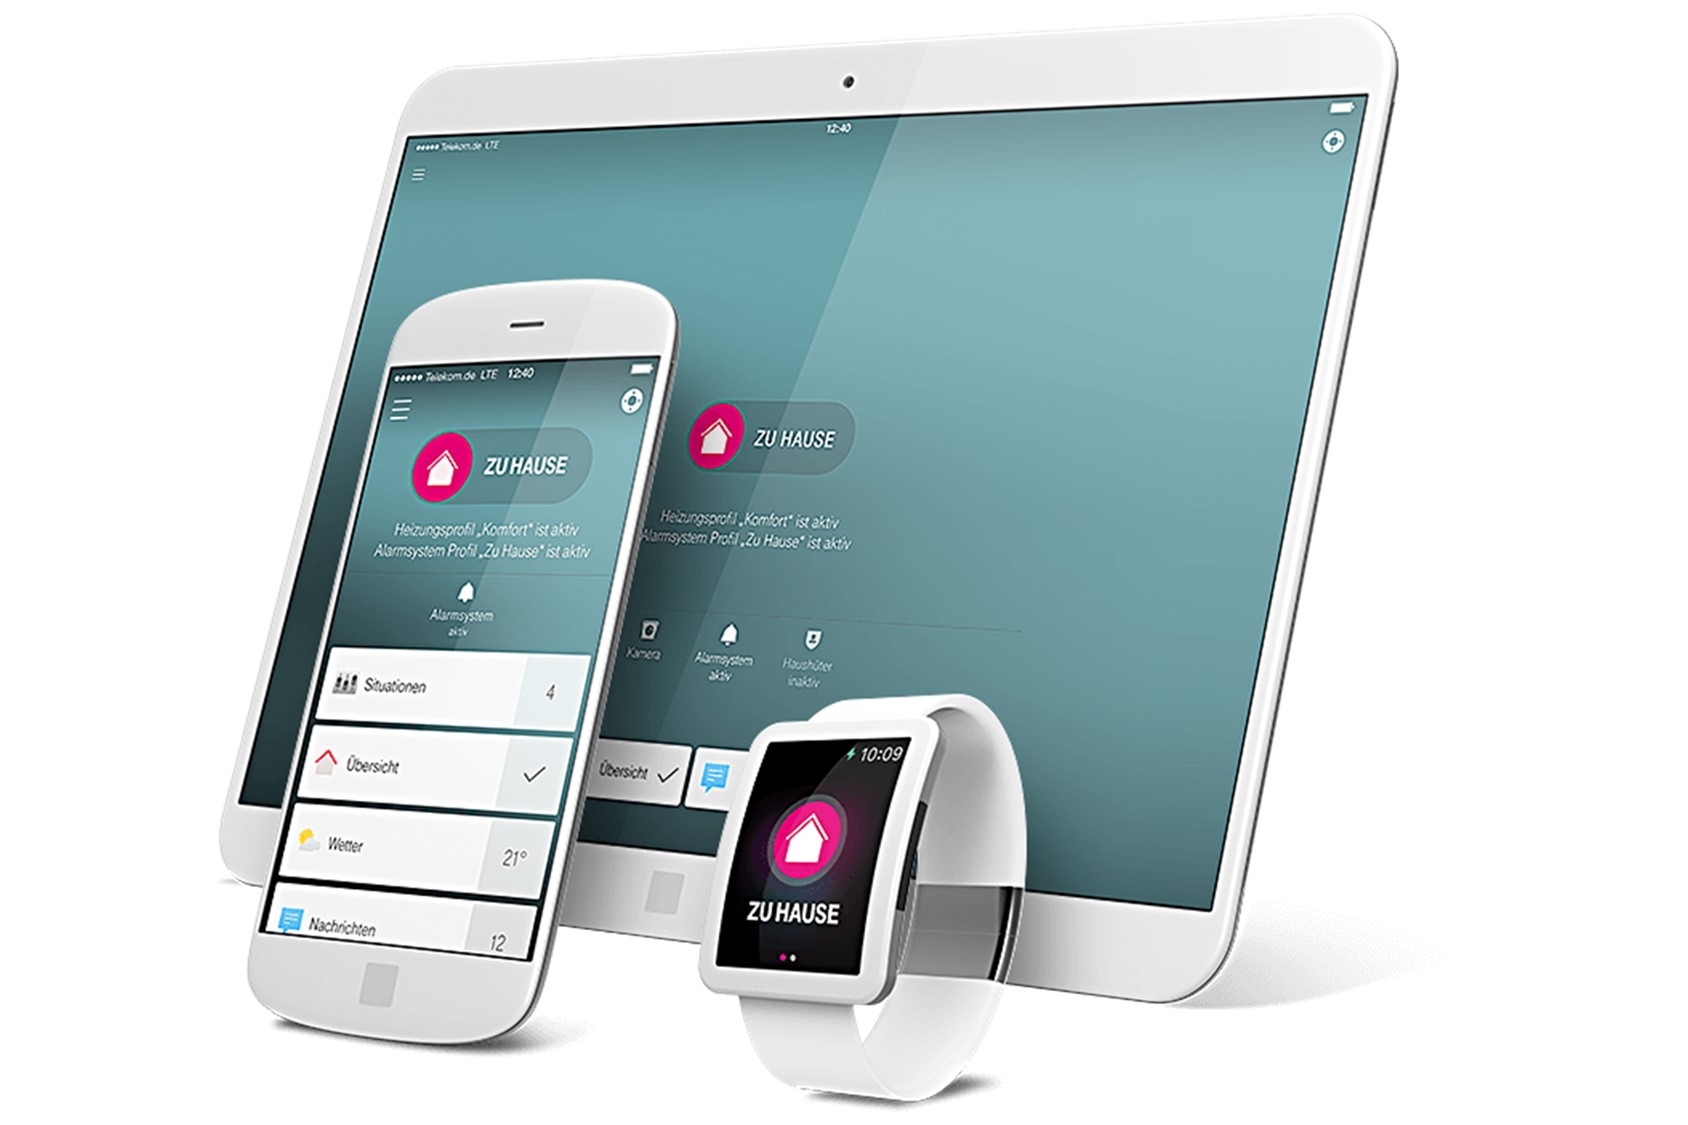 telekom smart home eine smart home plattform f r europa. Black Bedroom Furniture Sets. Home Design Ideas